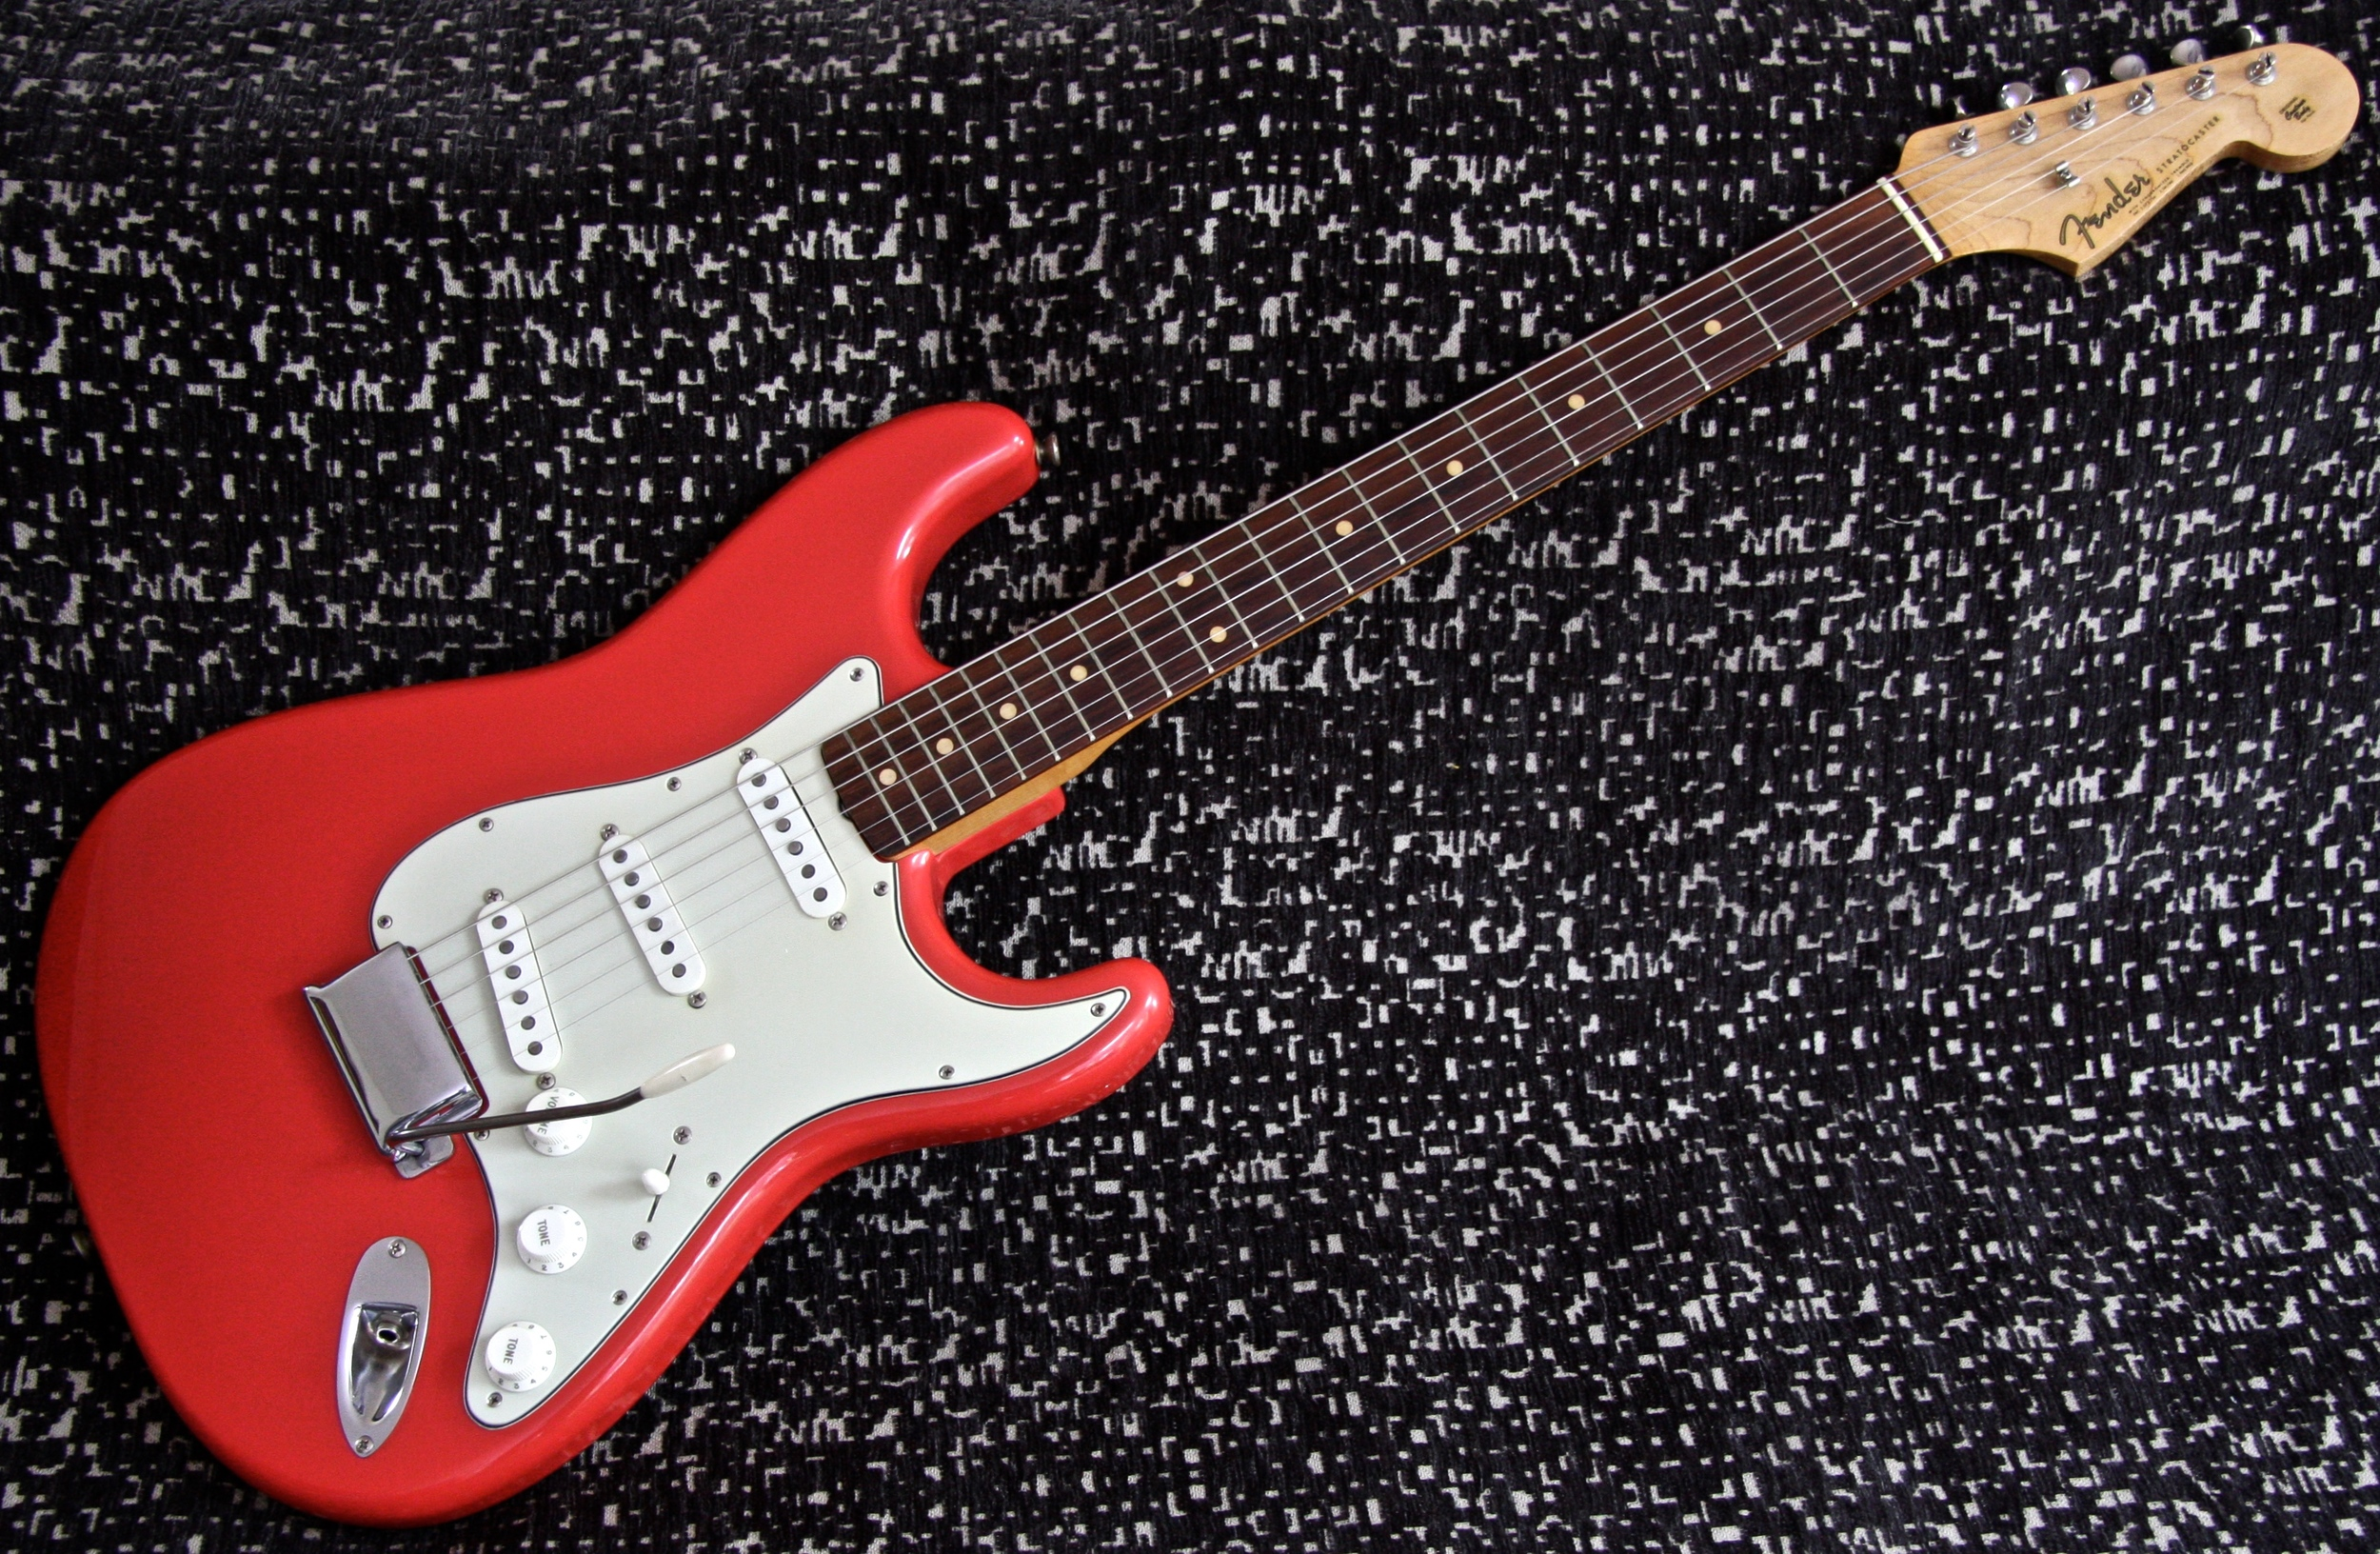 1962 Fender Stratocaster - Fiesta Red